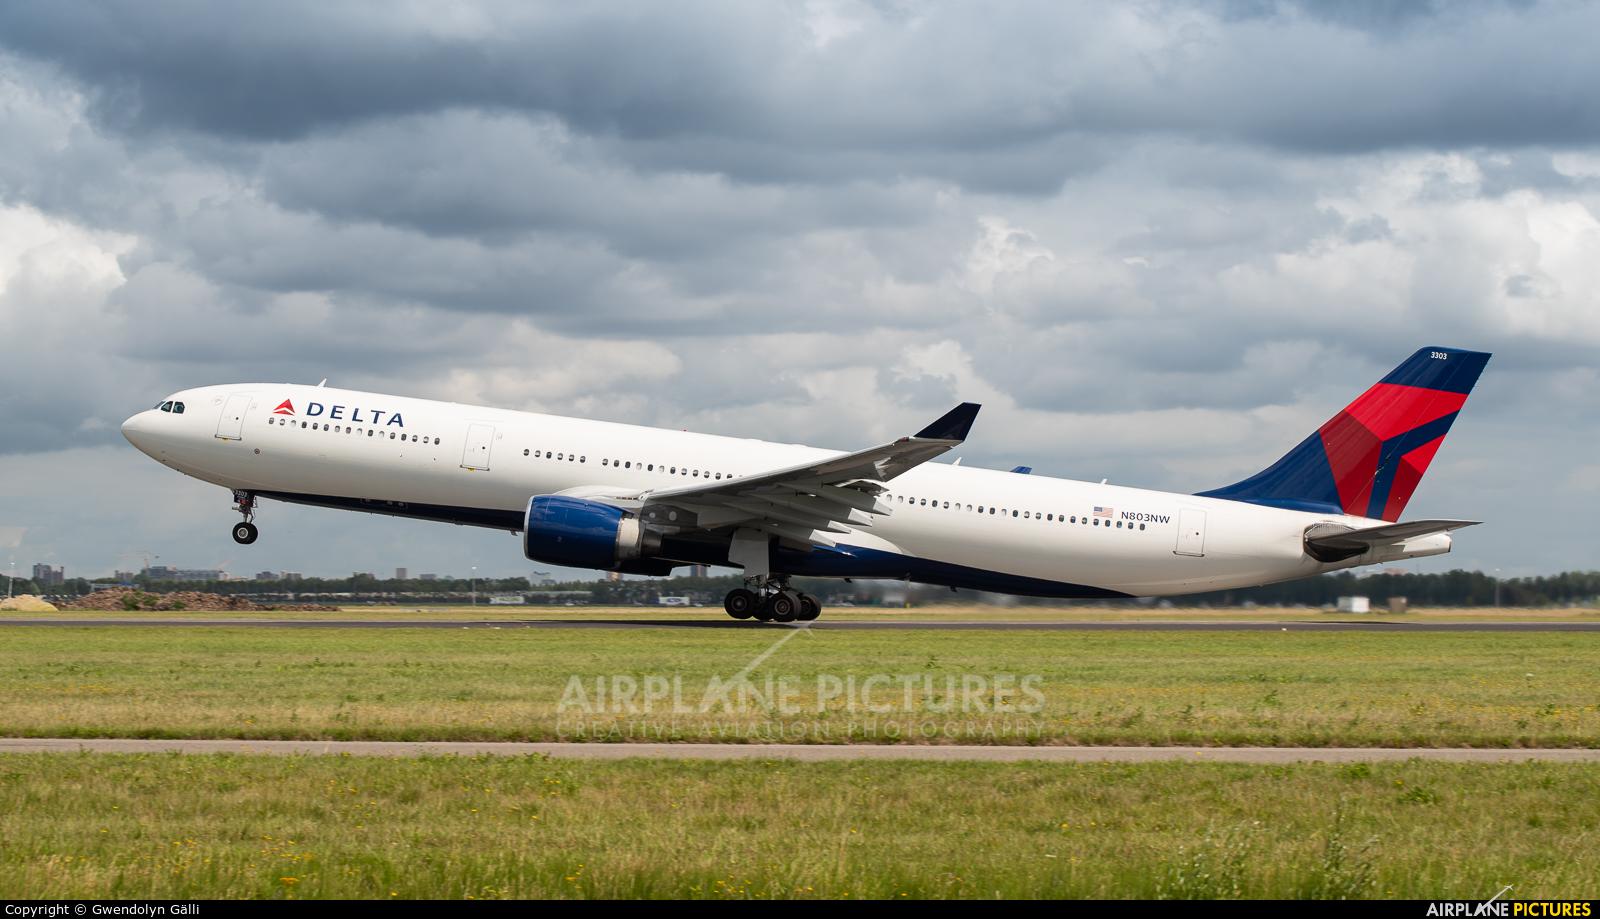 Delta Air Lines N803NW aircraft at Amsterdam - Schiphol